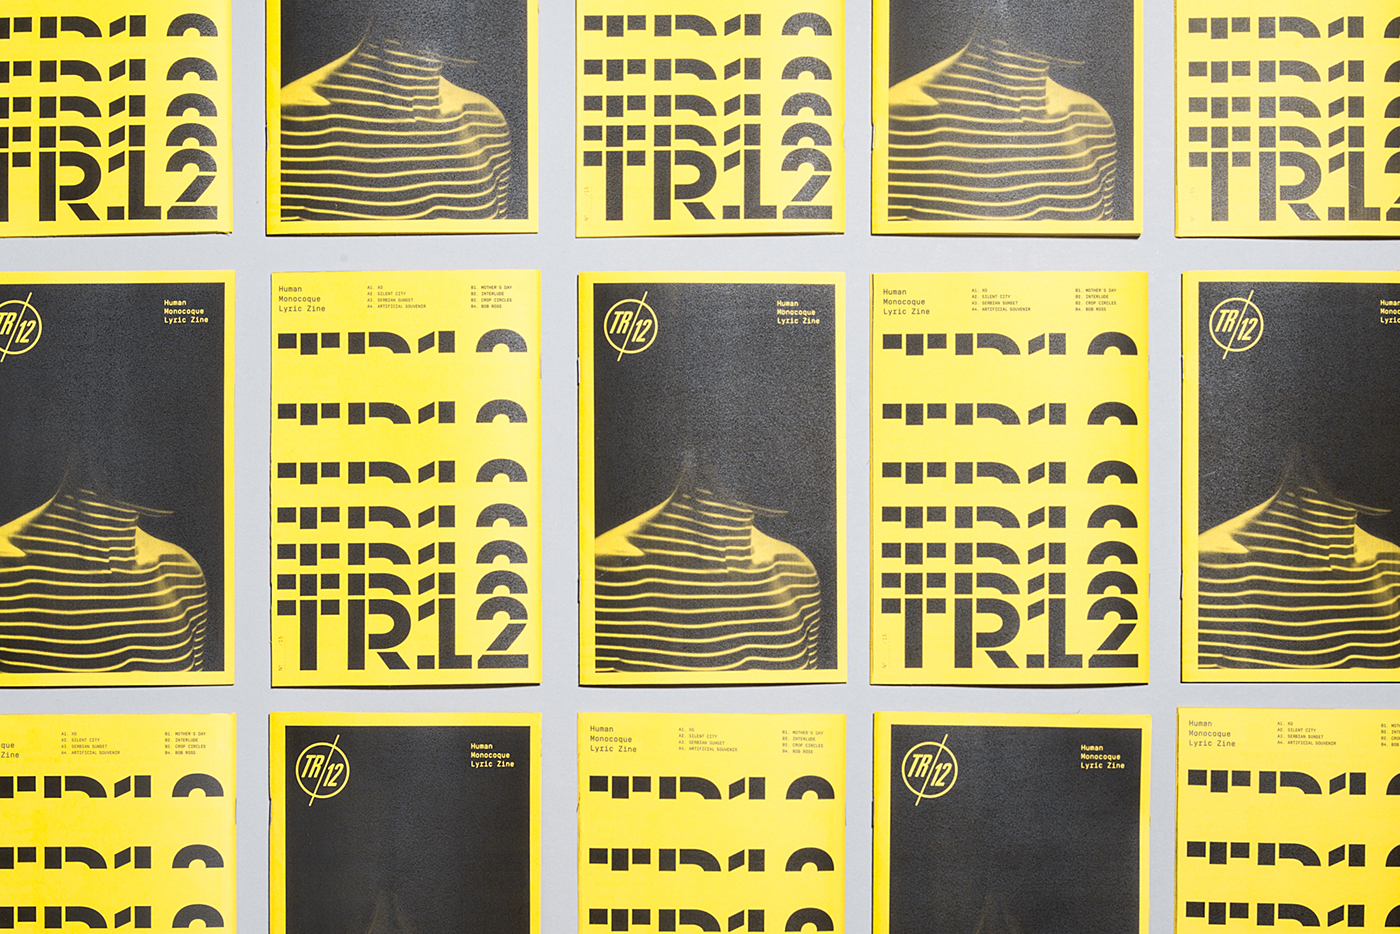 cassette Zine  fanzine music DIY editorial type typography   roland sh101